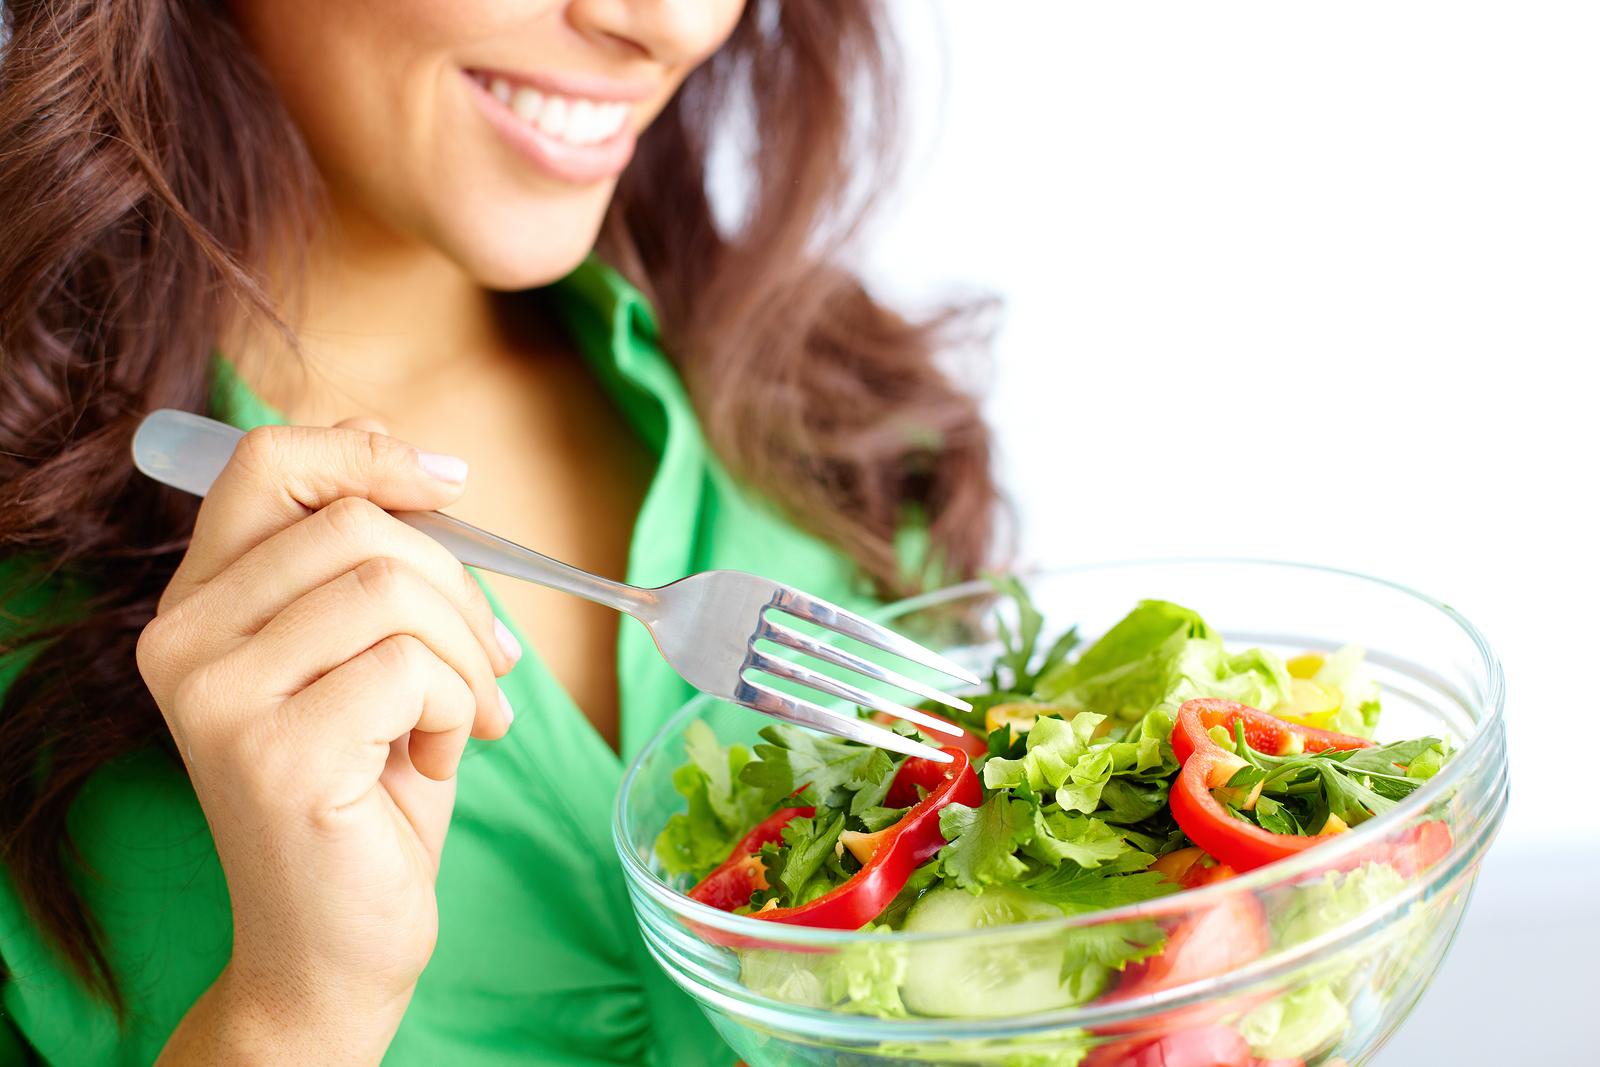 Dieta Vegetariana e rischio Diabete: l'ultima scoperta